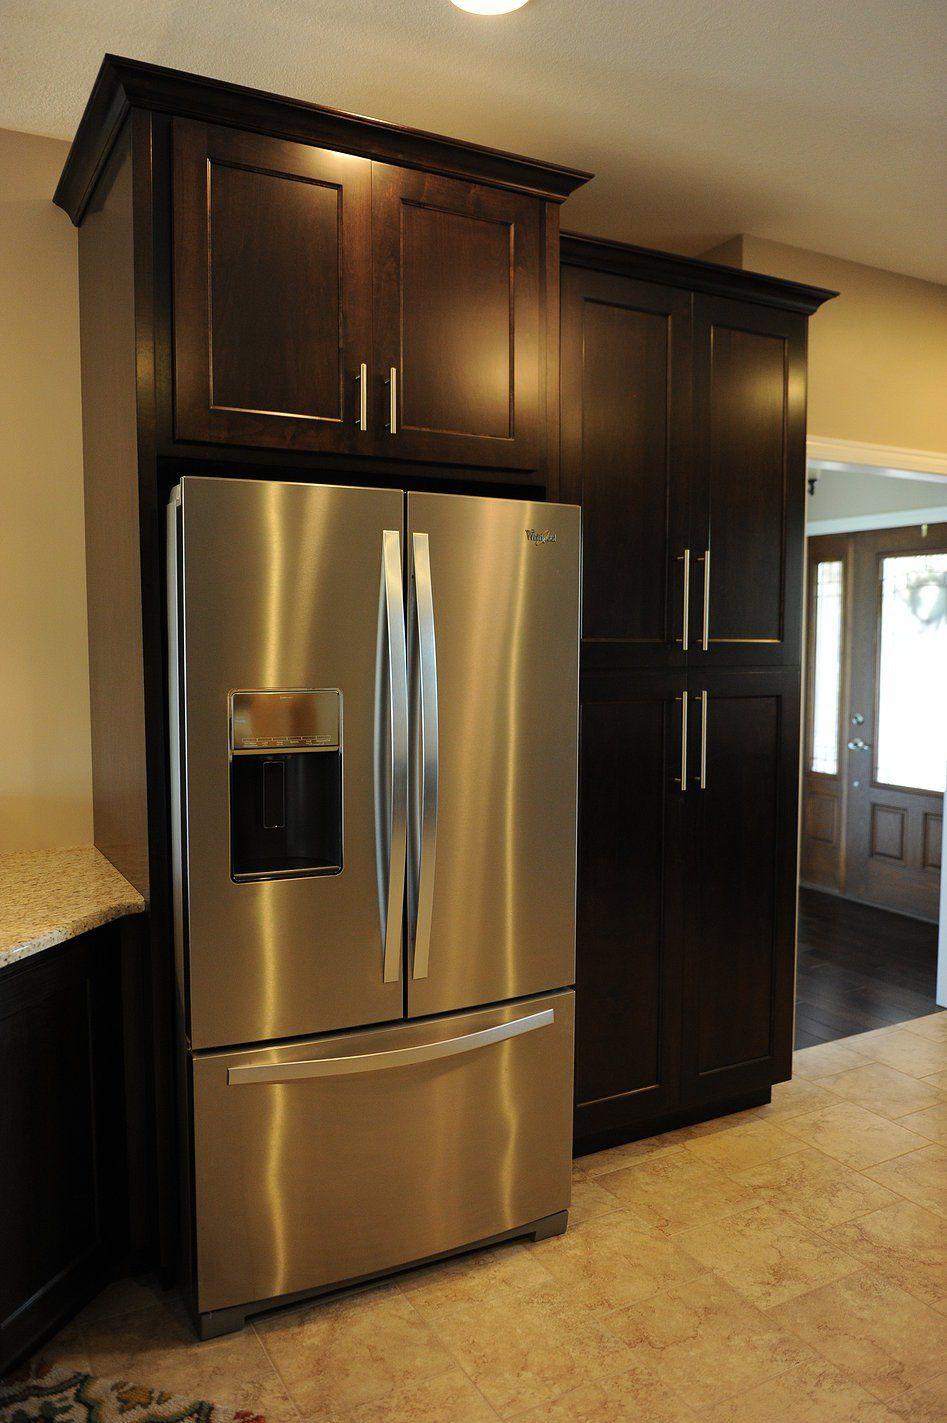 built in refrigerator cabinet. Cabinet Storage Built Refrigerator Cupboard Kitchen Build Outdoor Cabinets In 7